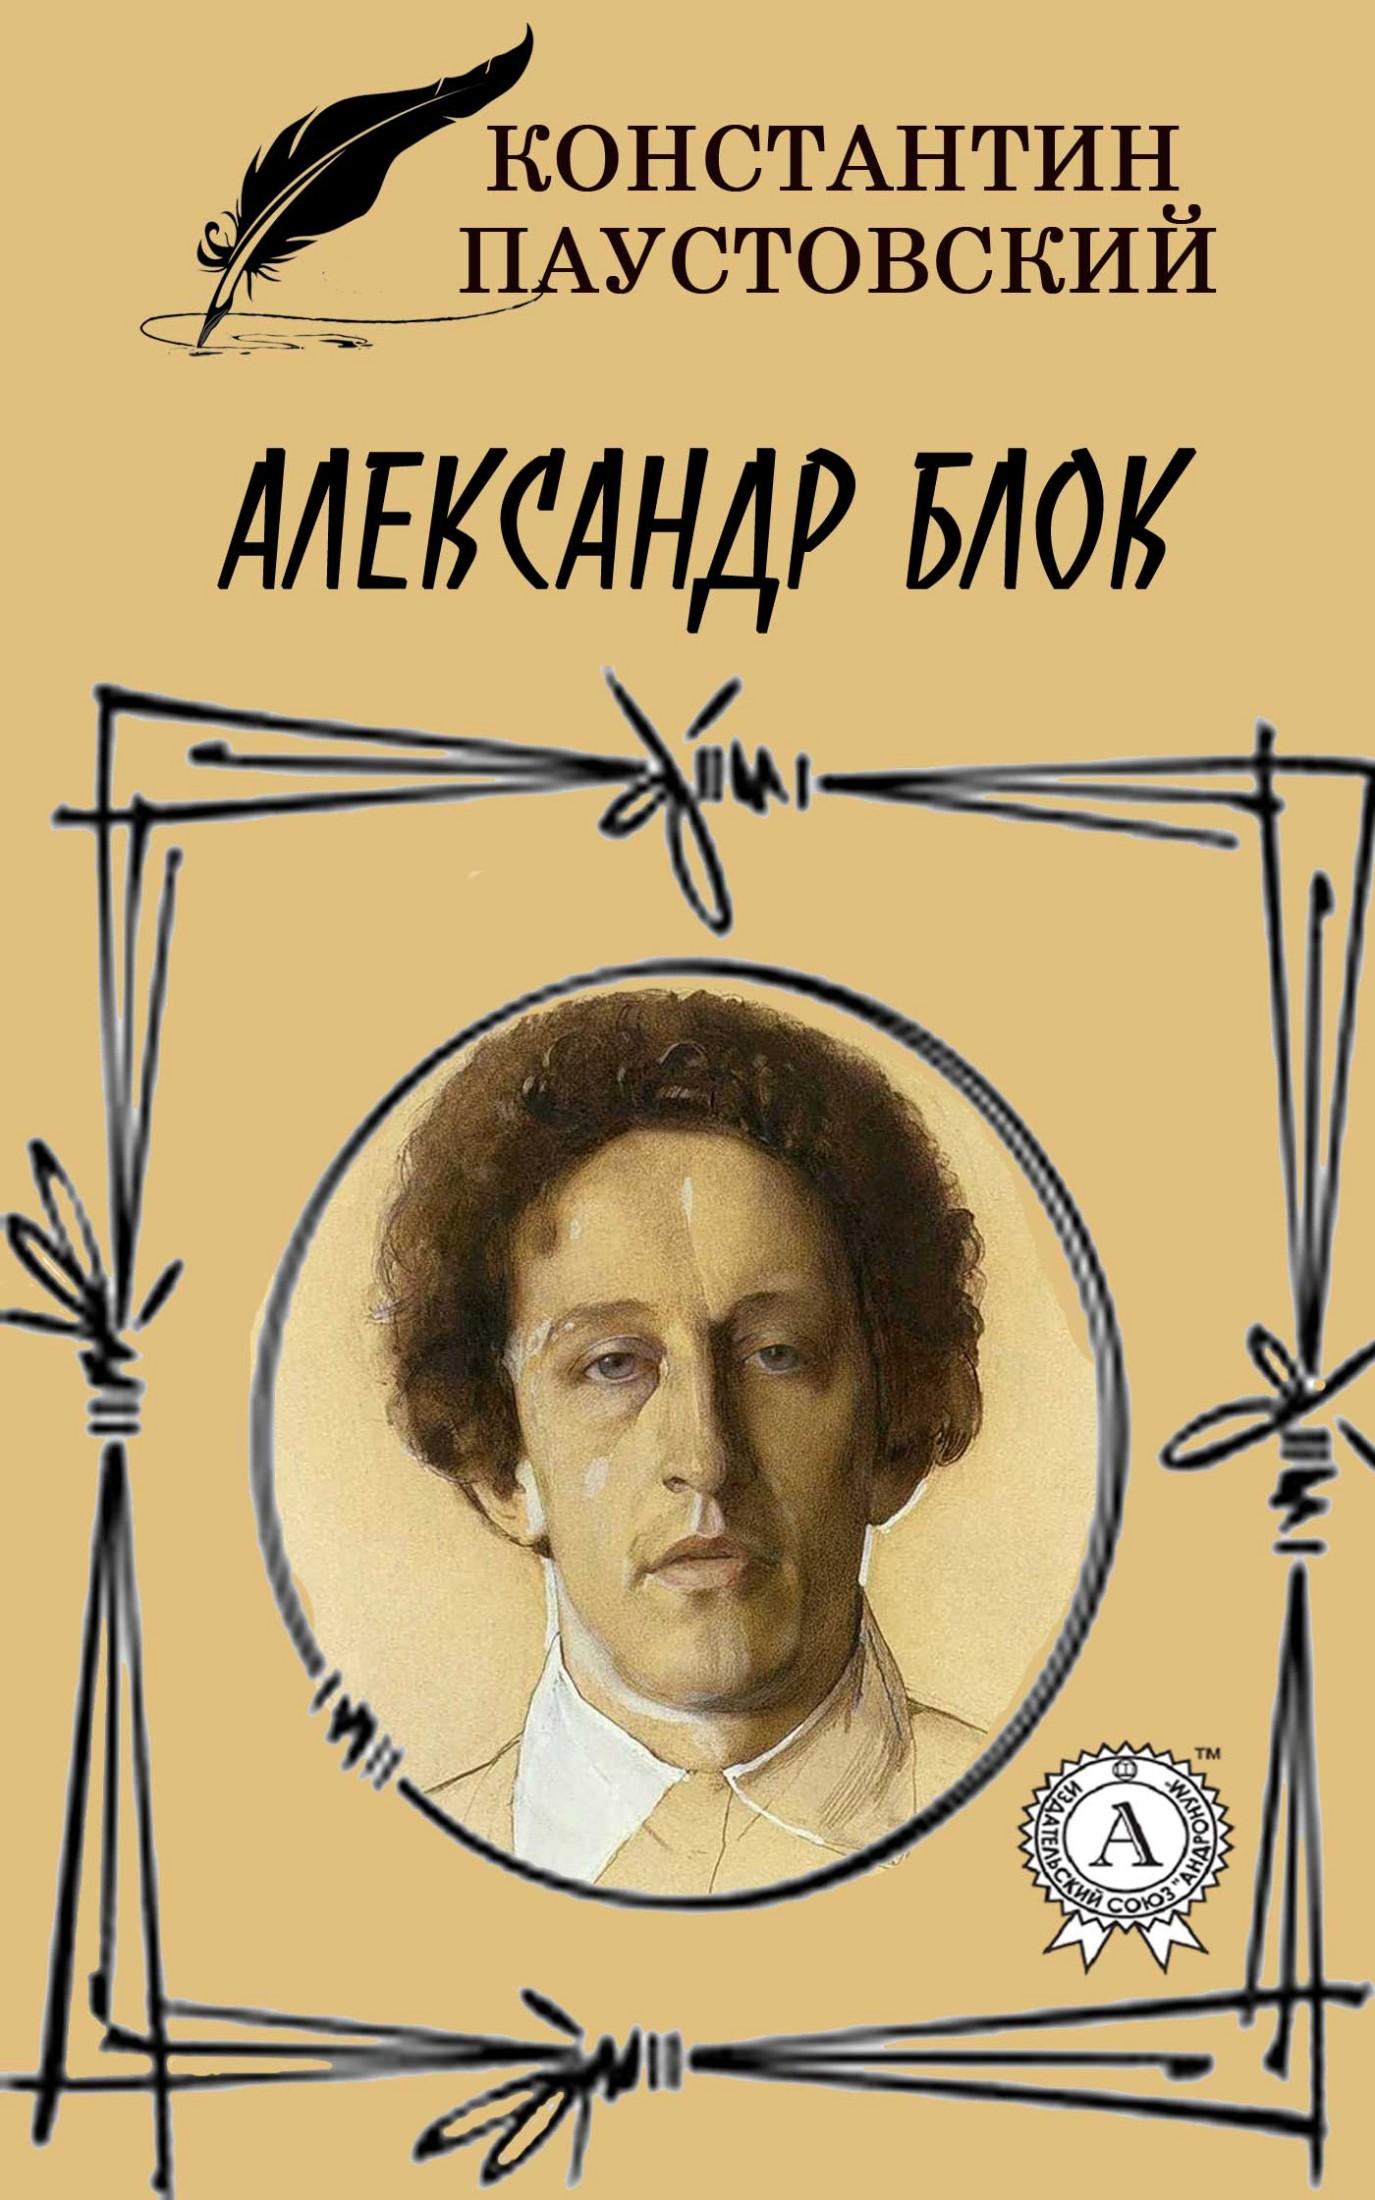 Костянтин Паустовський Александр Блок